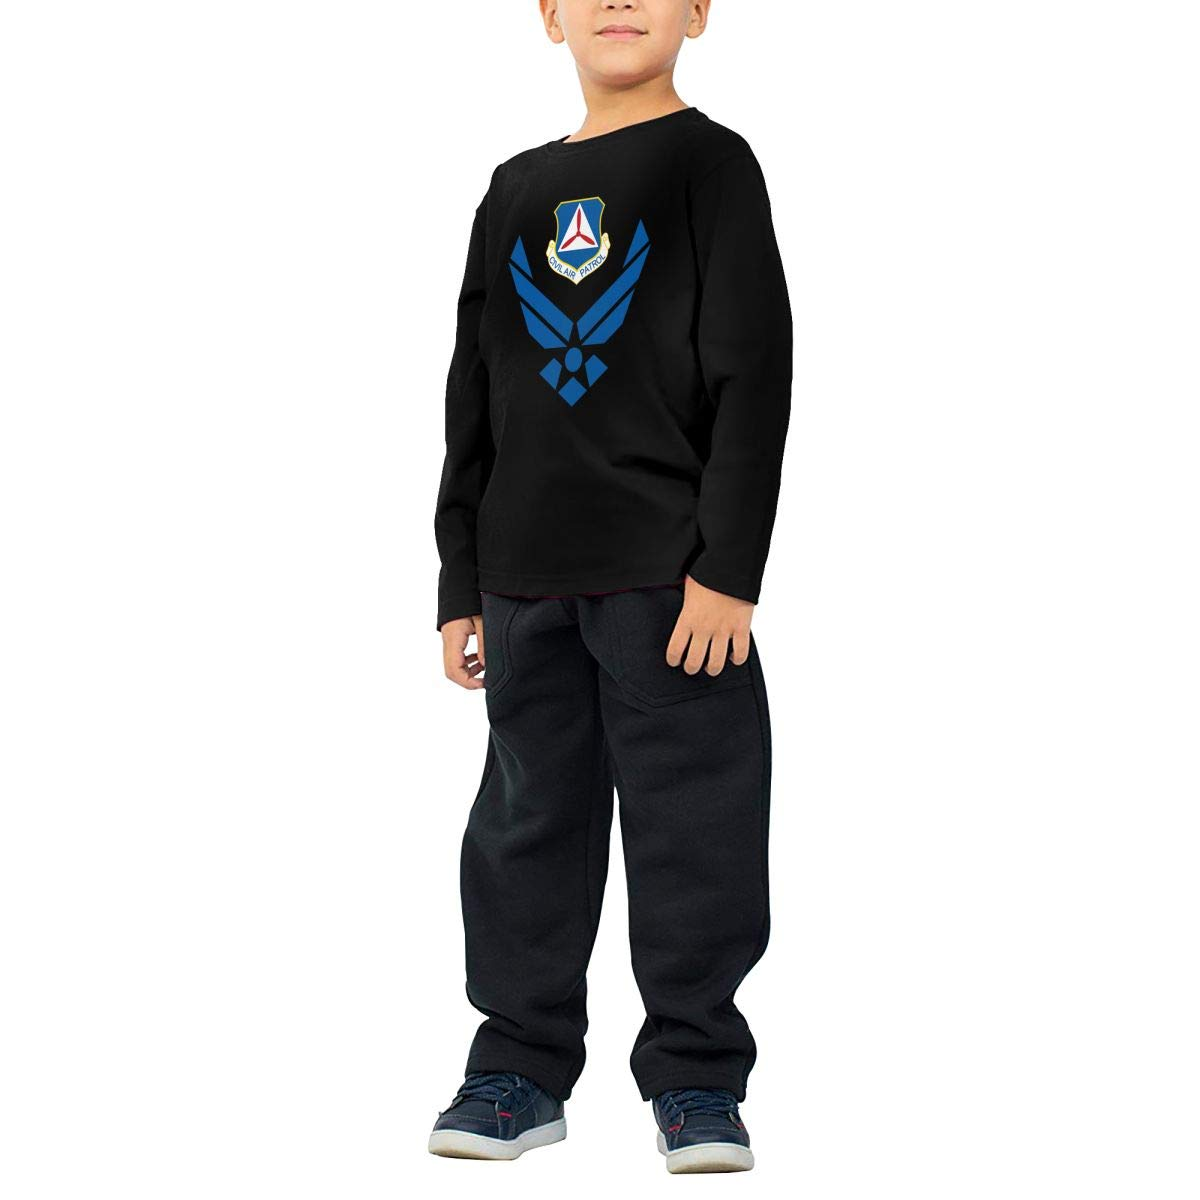 Civil Air Patrol Childrens Long Sleeve T-Shirt Boys Girls Cotton Tee Tops